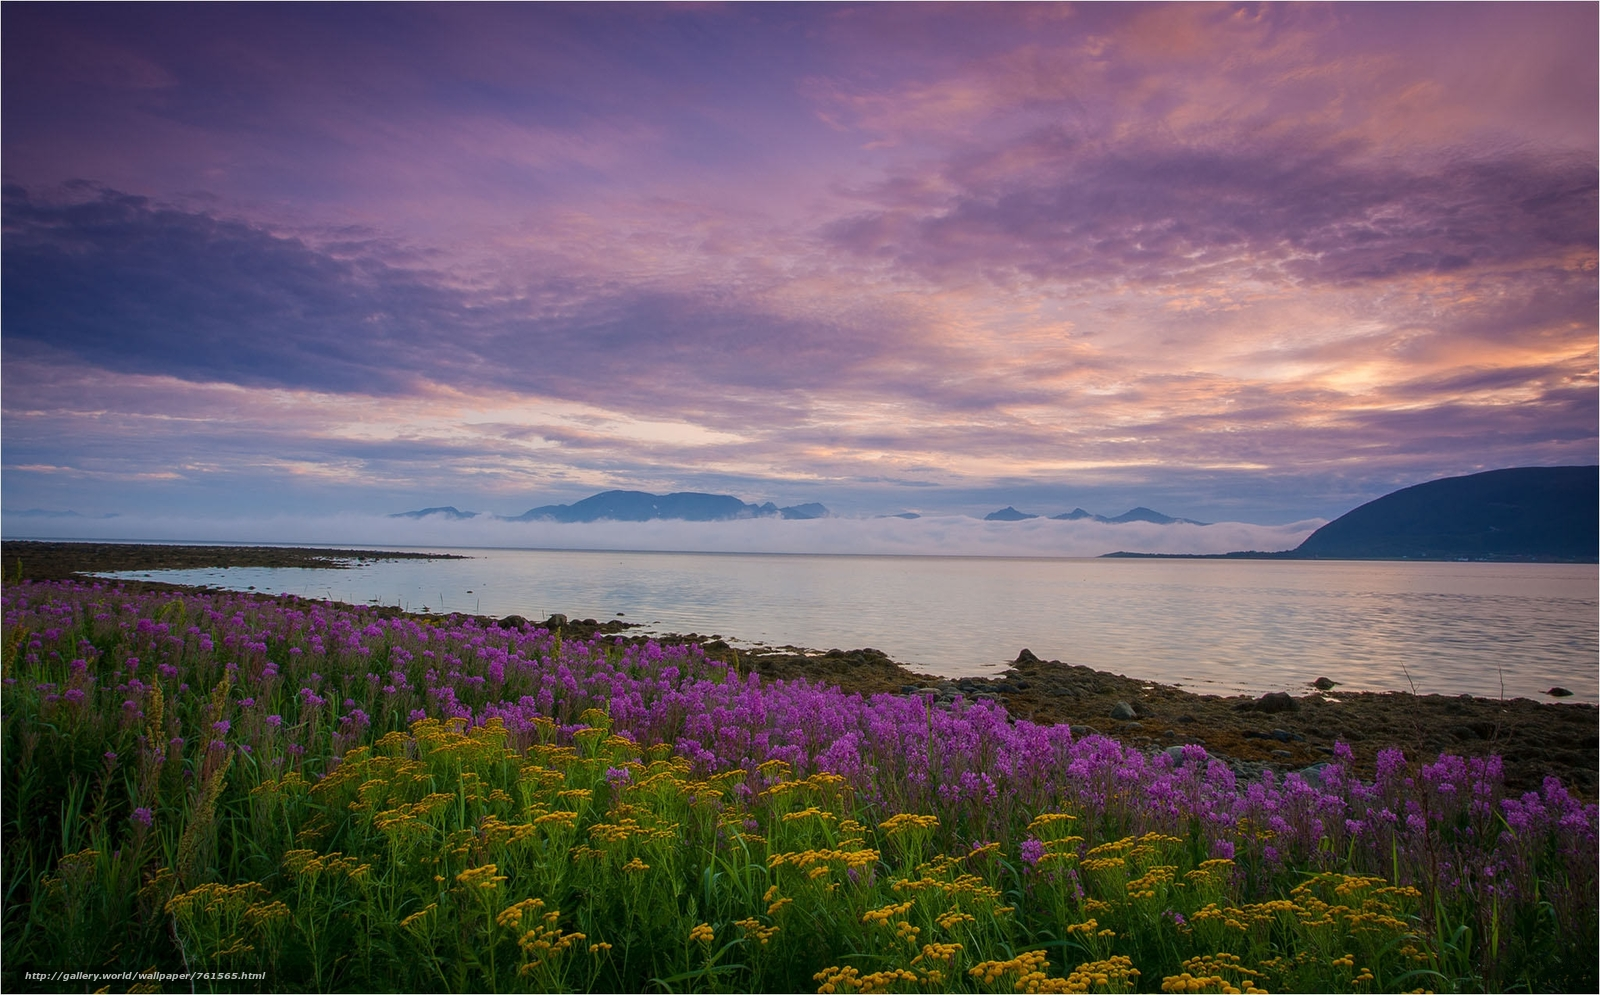 sunset, River, Coast, flowers, landscape